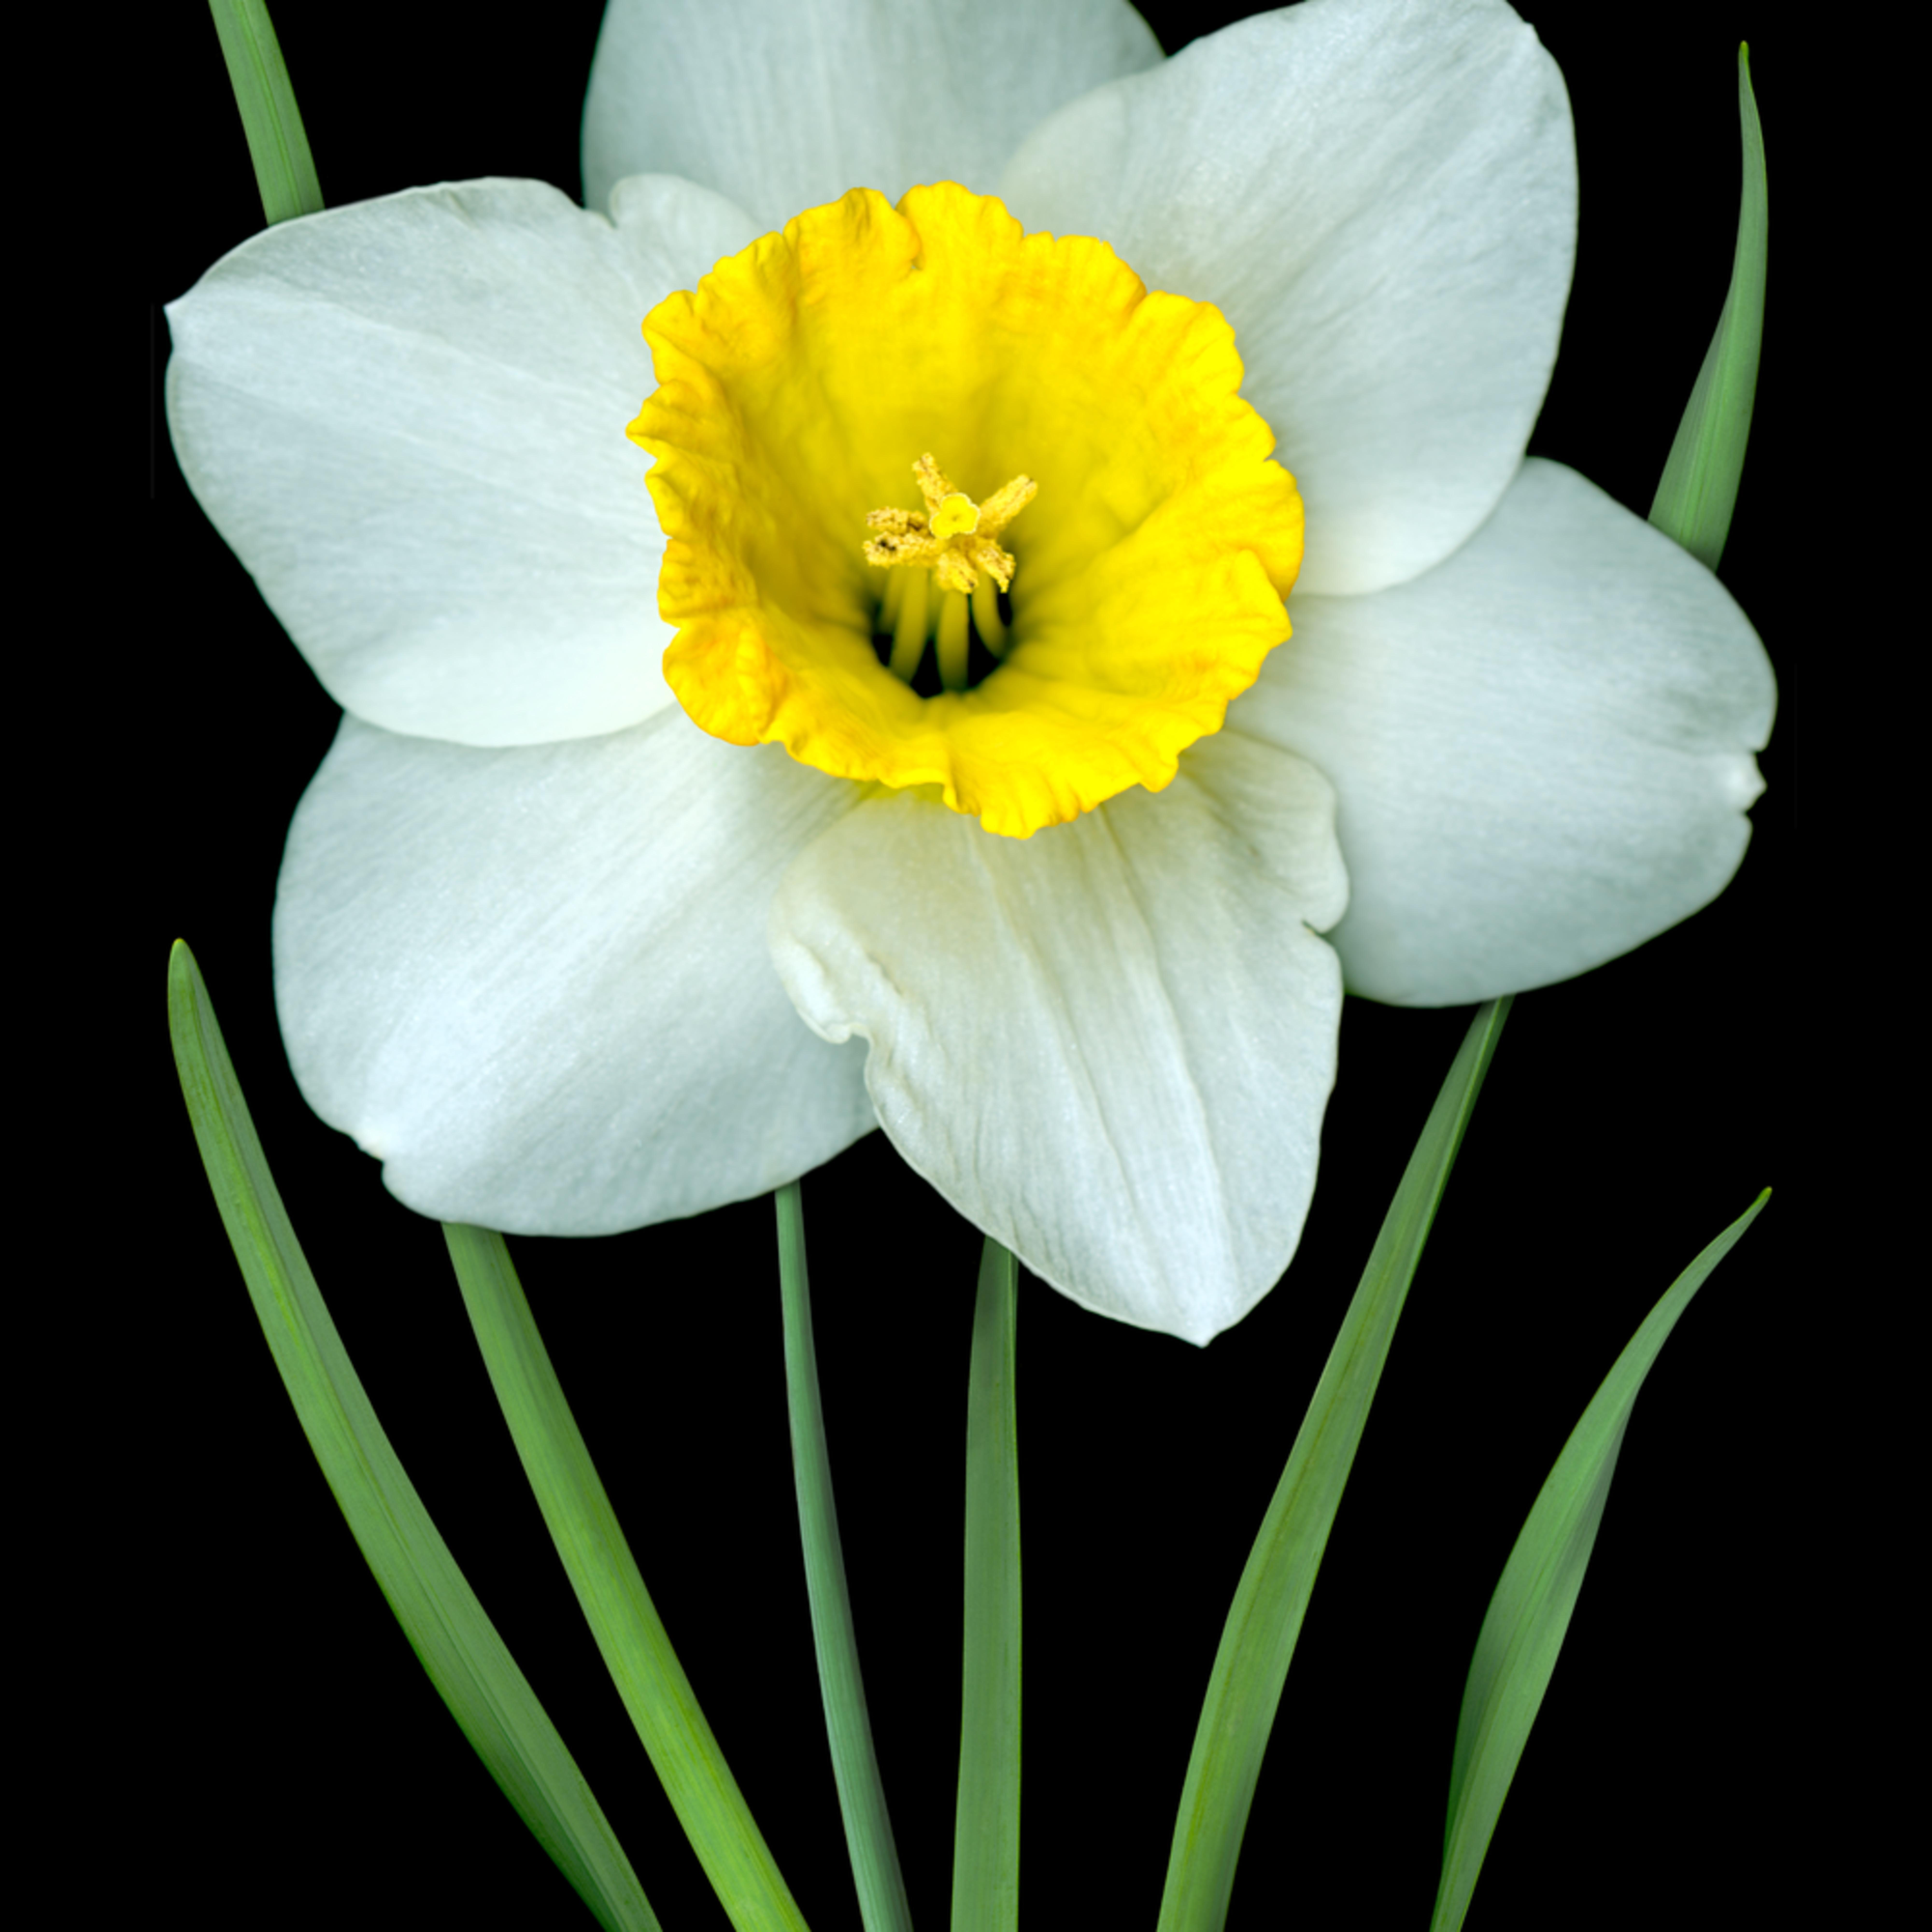 060404 ahern single white daffodil 30x40x300 videgv